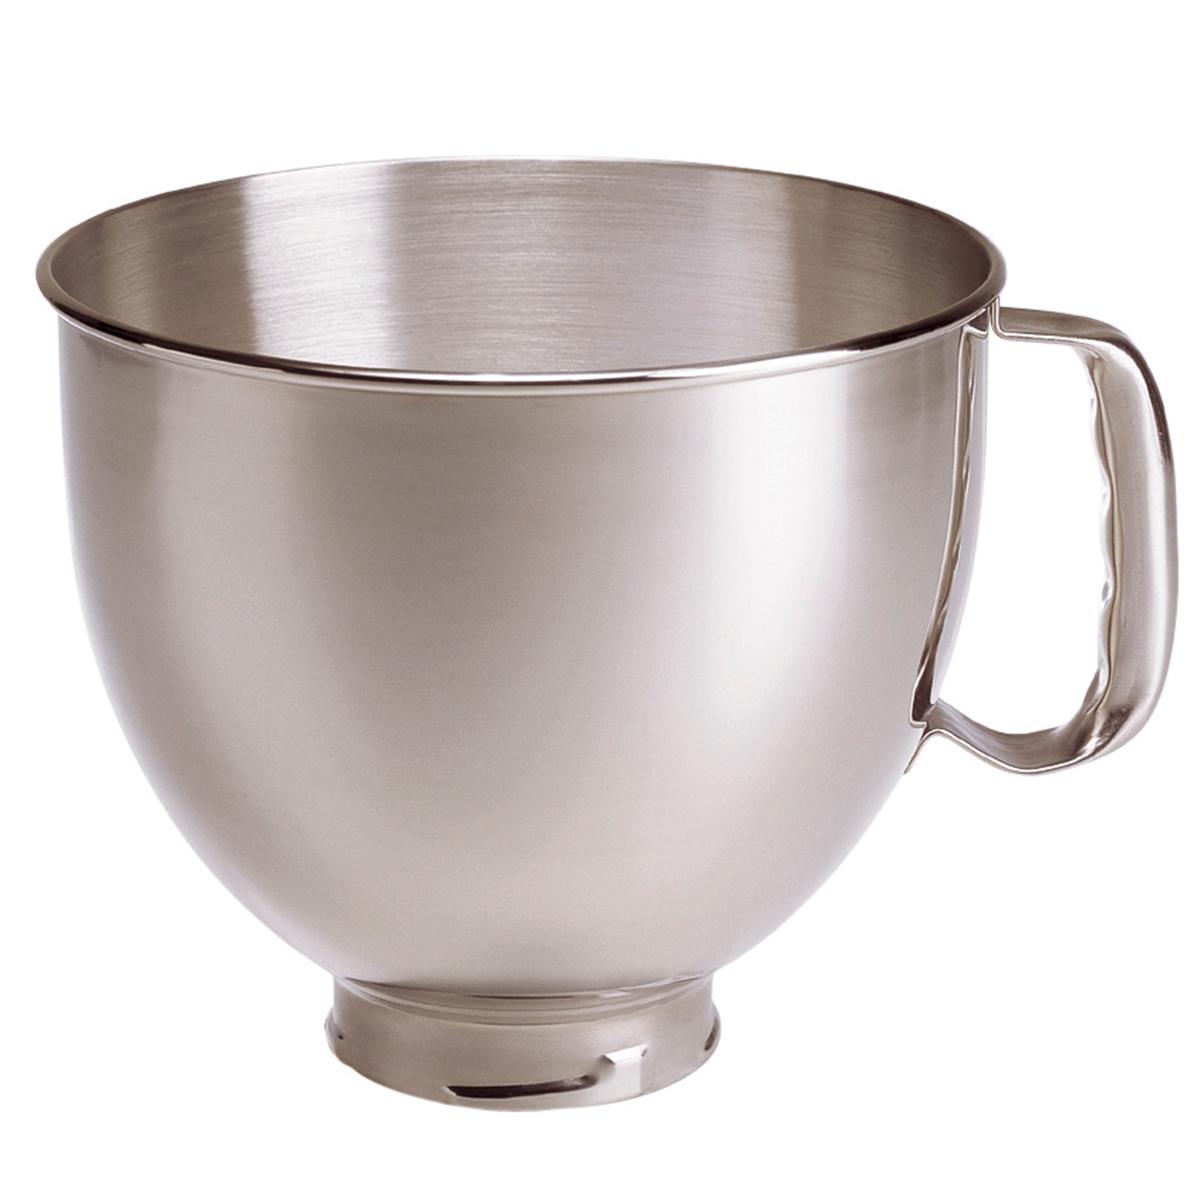 KitchenAid skål - 4,8 liter